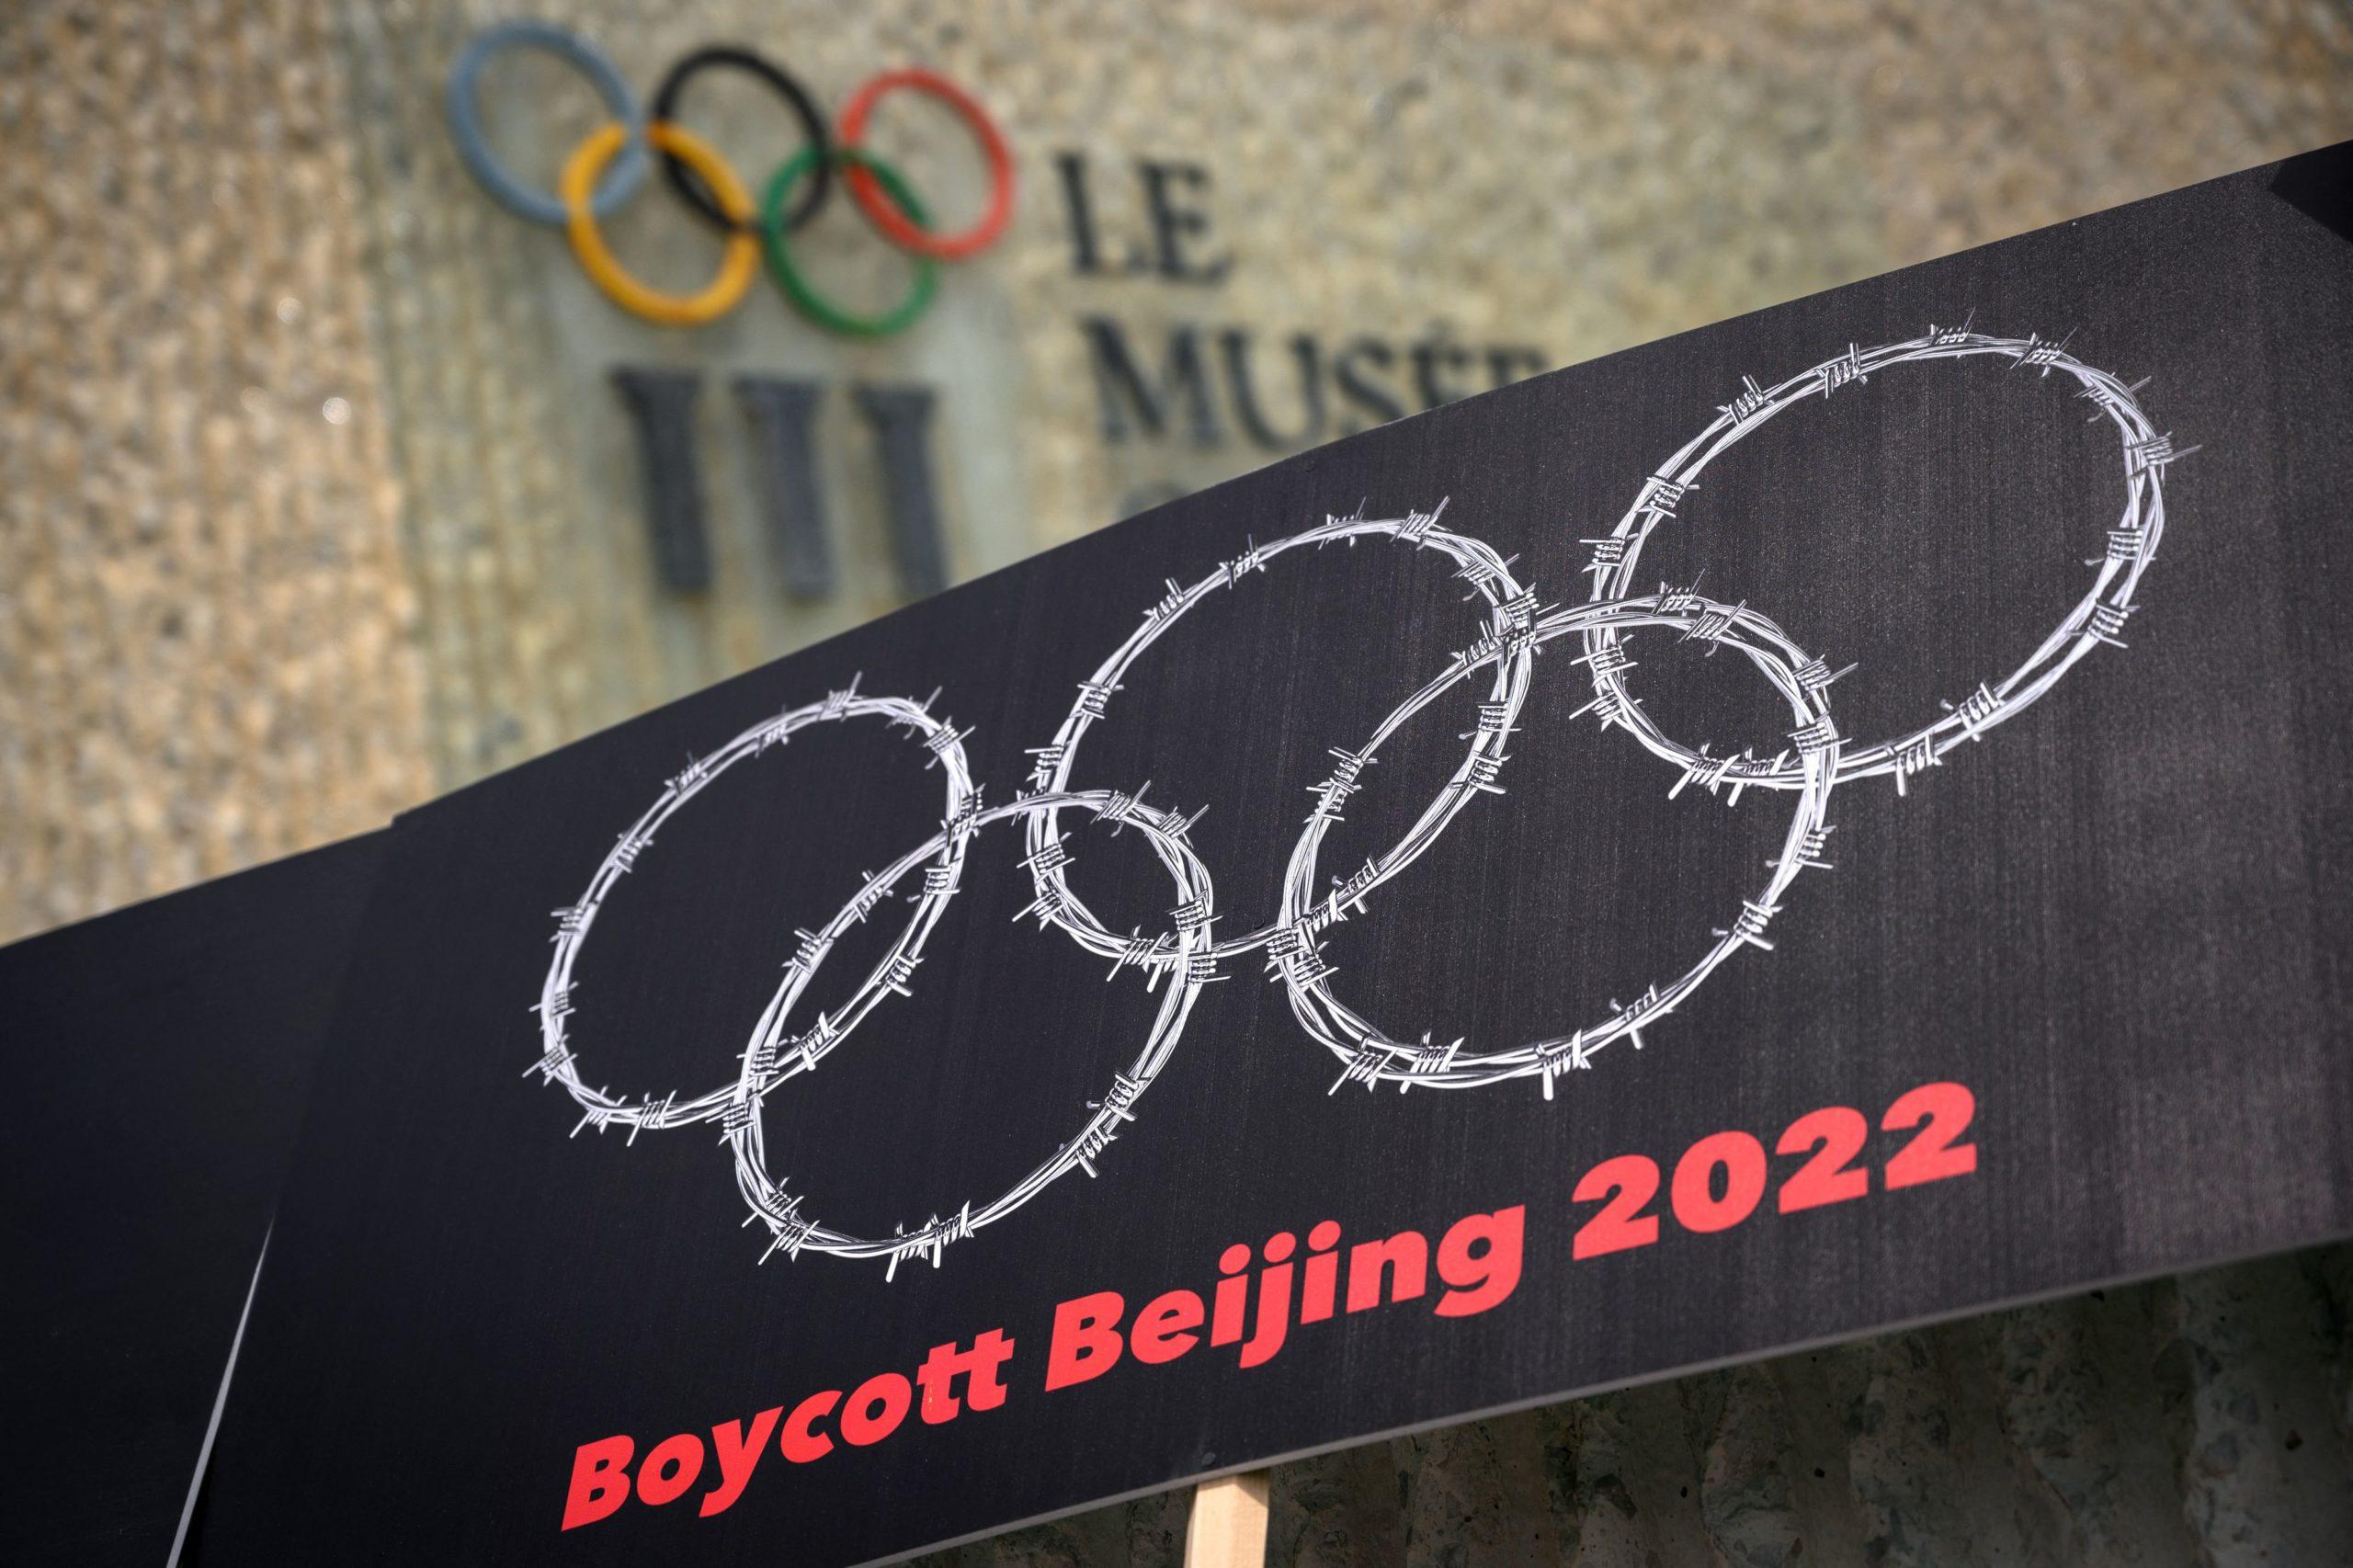 SWITZERLAND-CHINA-OLY-2022-POLITICS-DEMONSTRATION